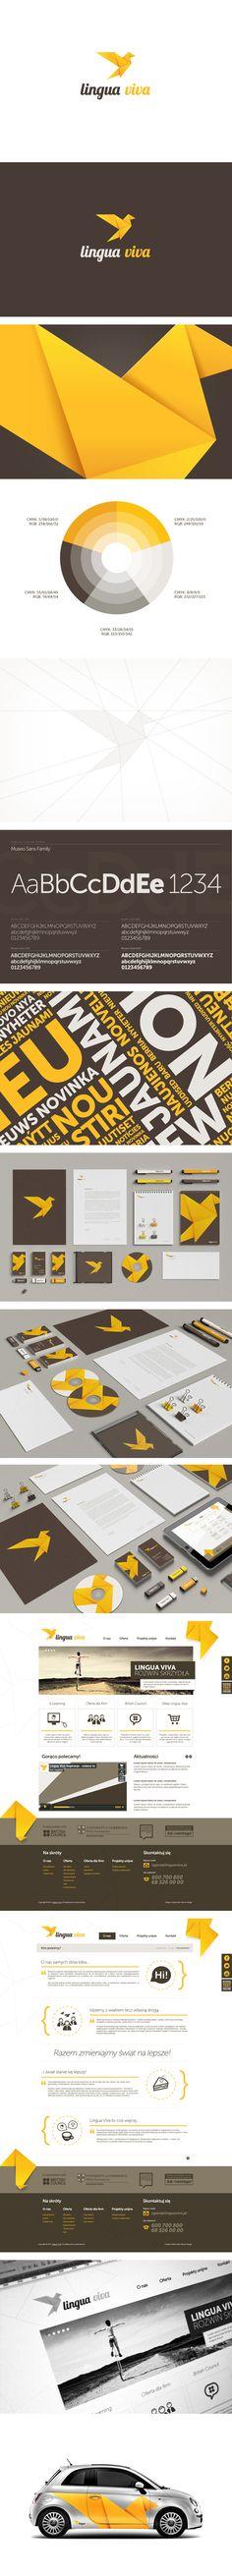 Lingua Viva - Language School. Visual Identity/Rebranding